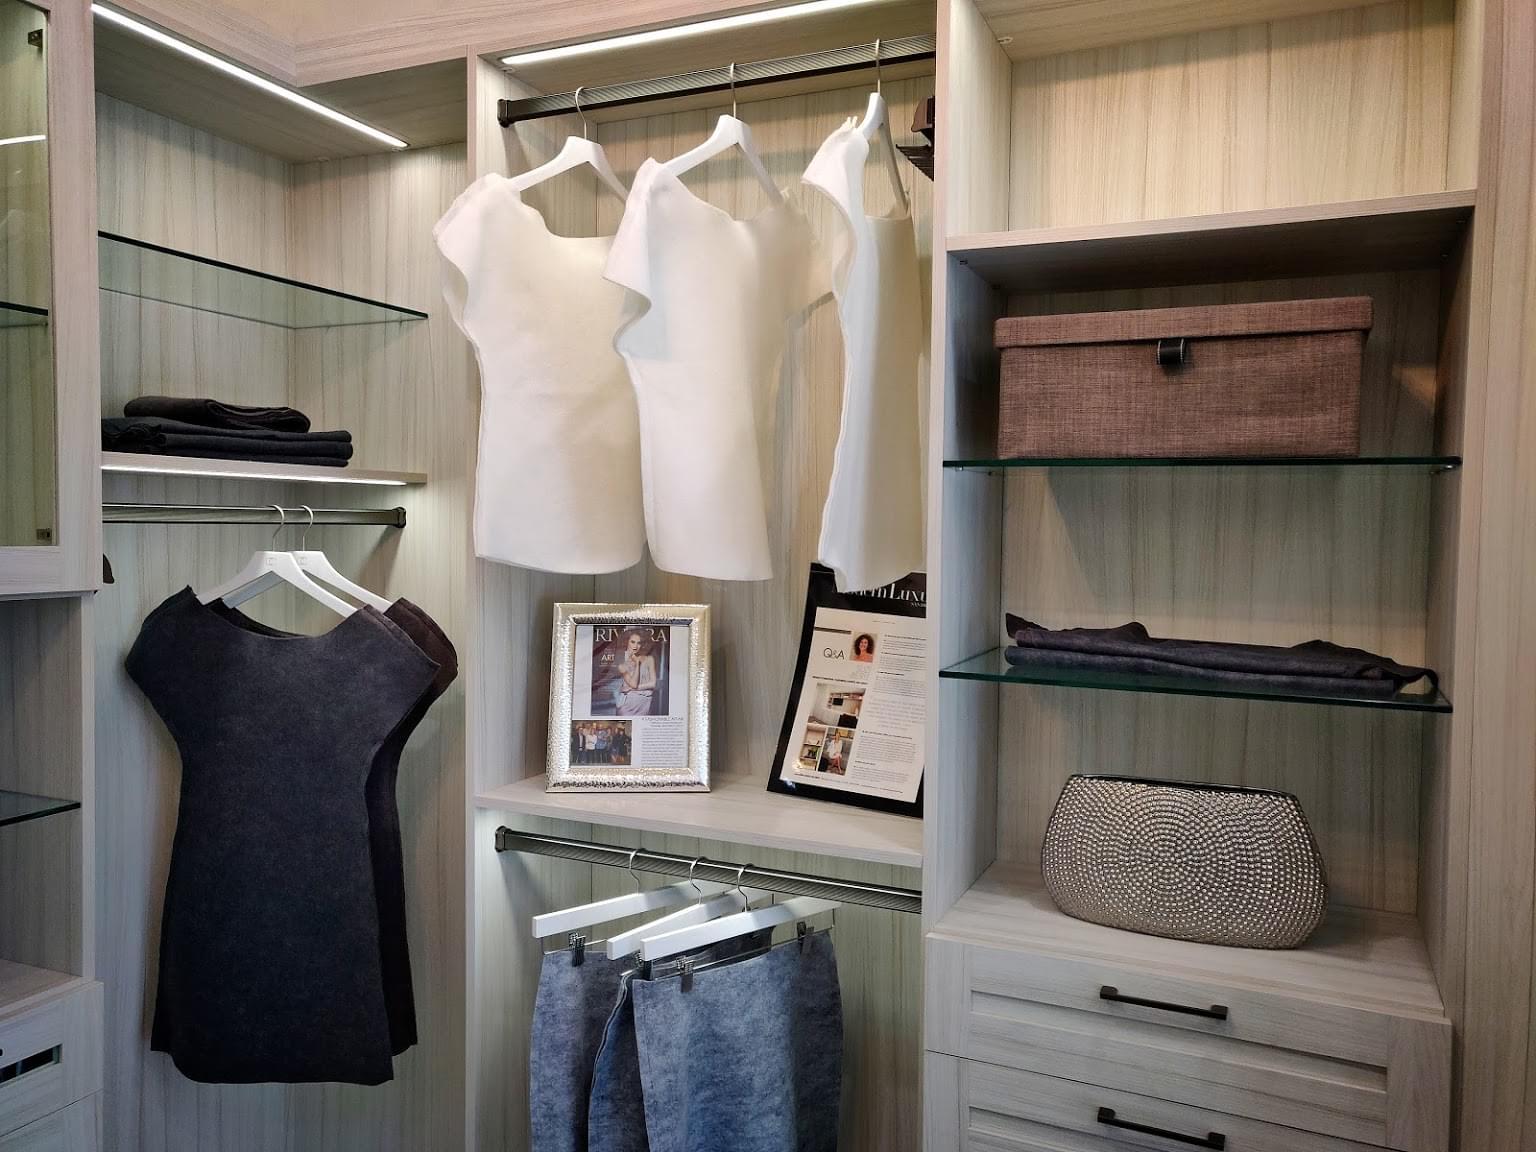 California Closets Interior designer in La Jolla, CA